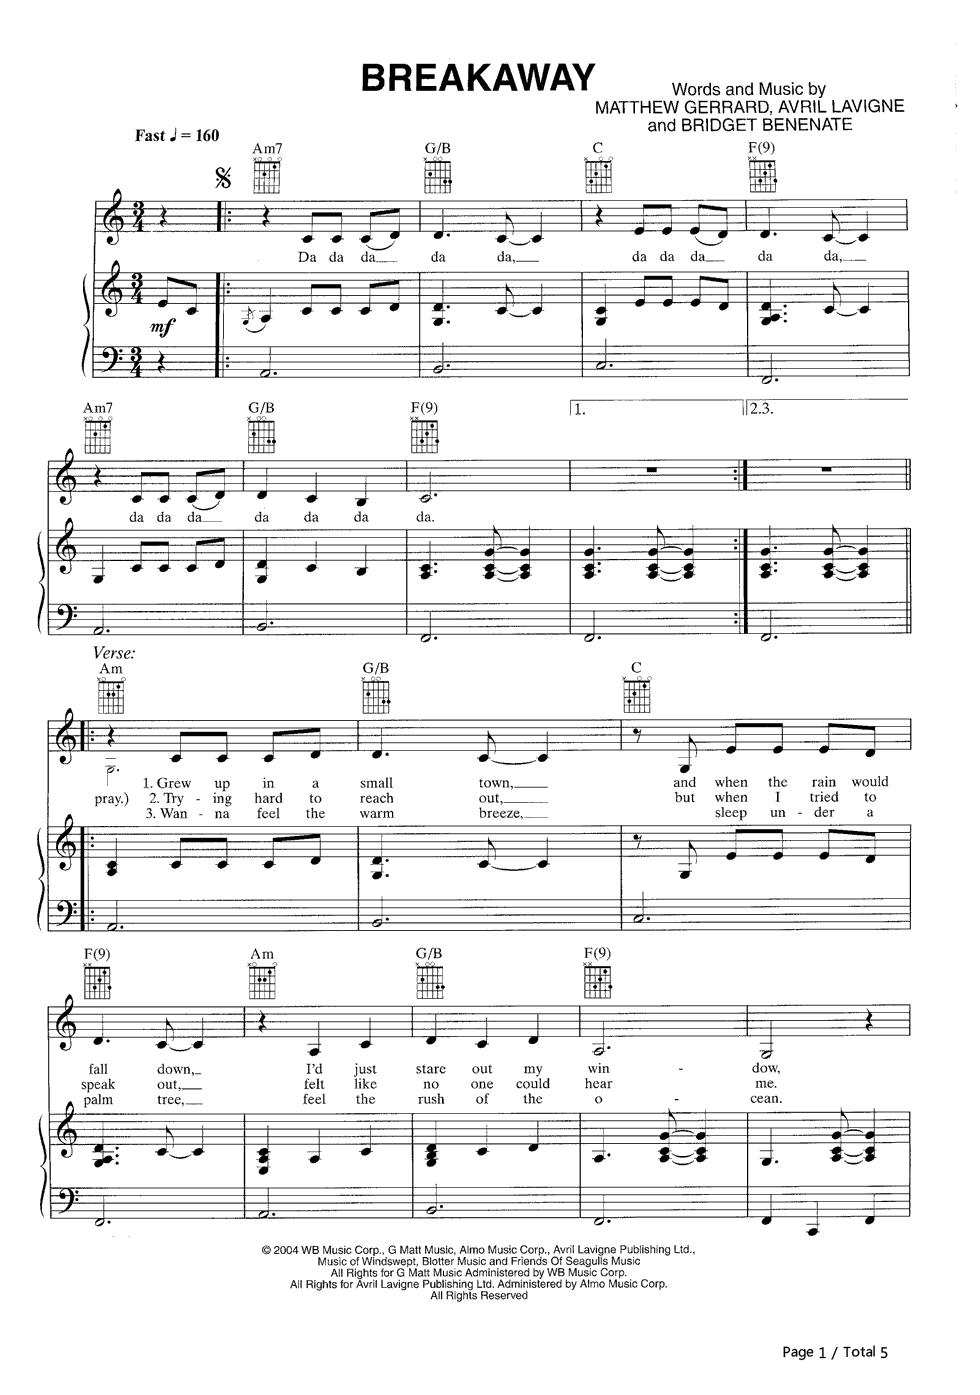 KELLY CLARKSON chords | E-Chords.com